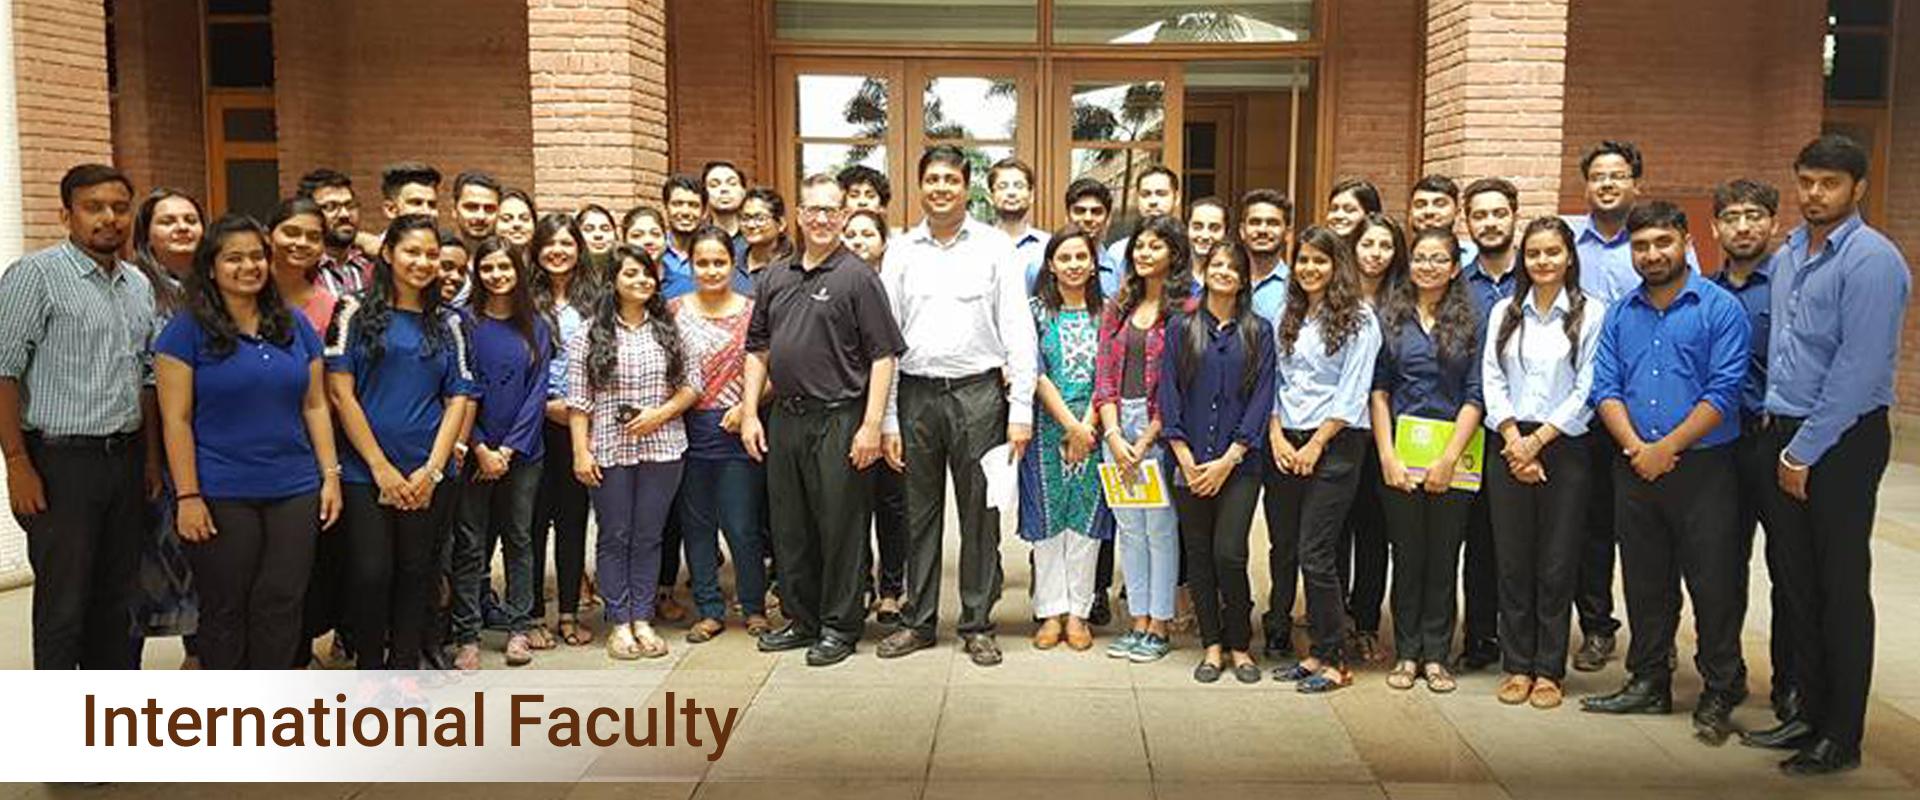 International Faculty